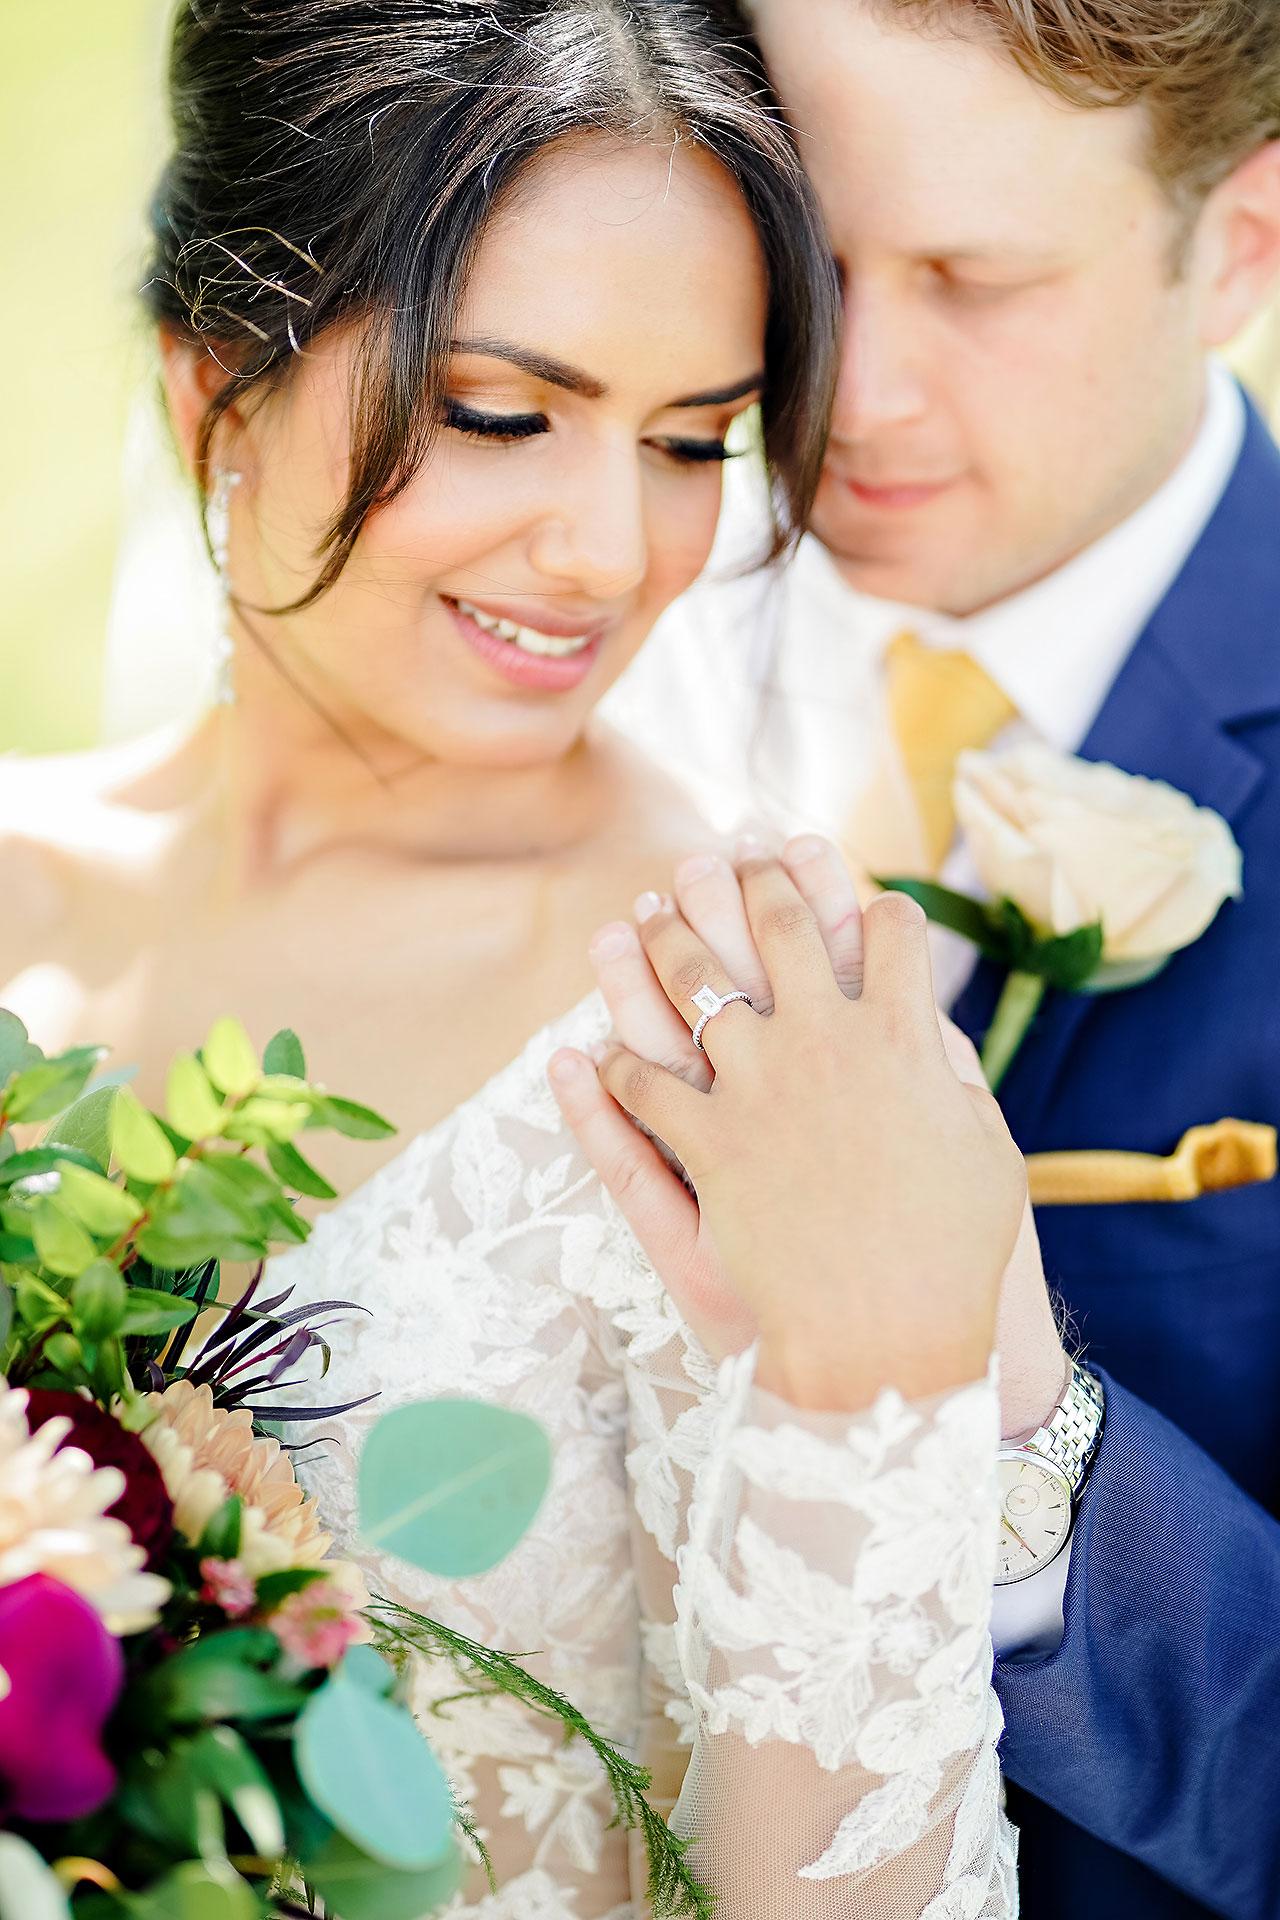 Nadia Parker Black Iris Estate Carmel Indiana Wedding May 2021 084